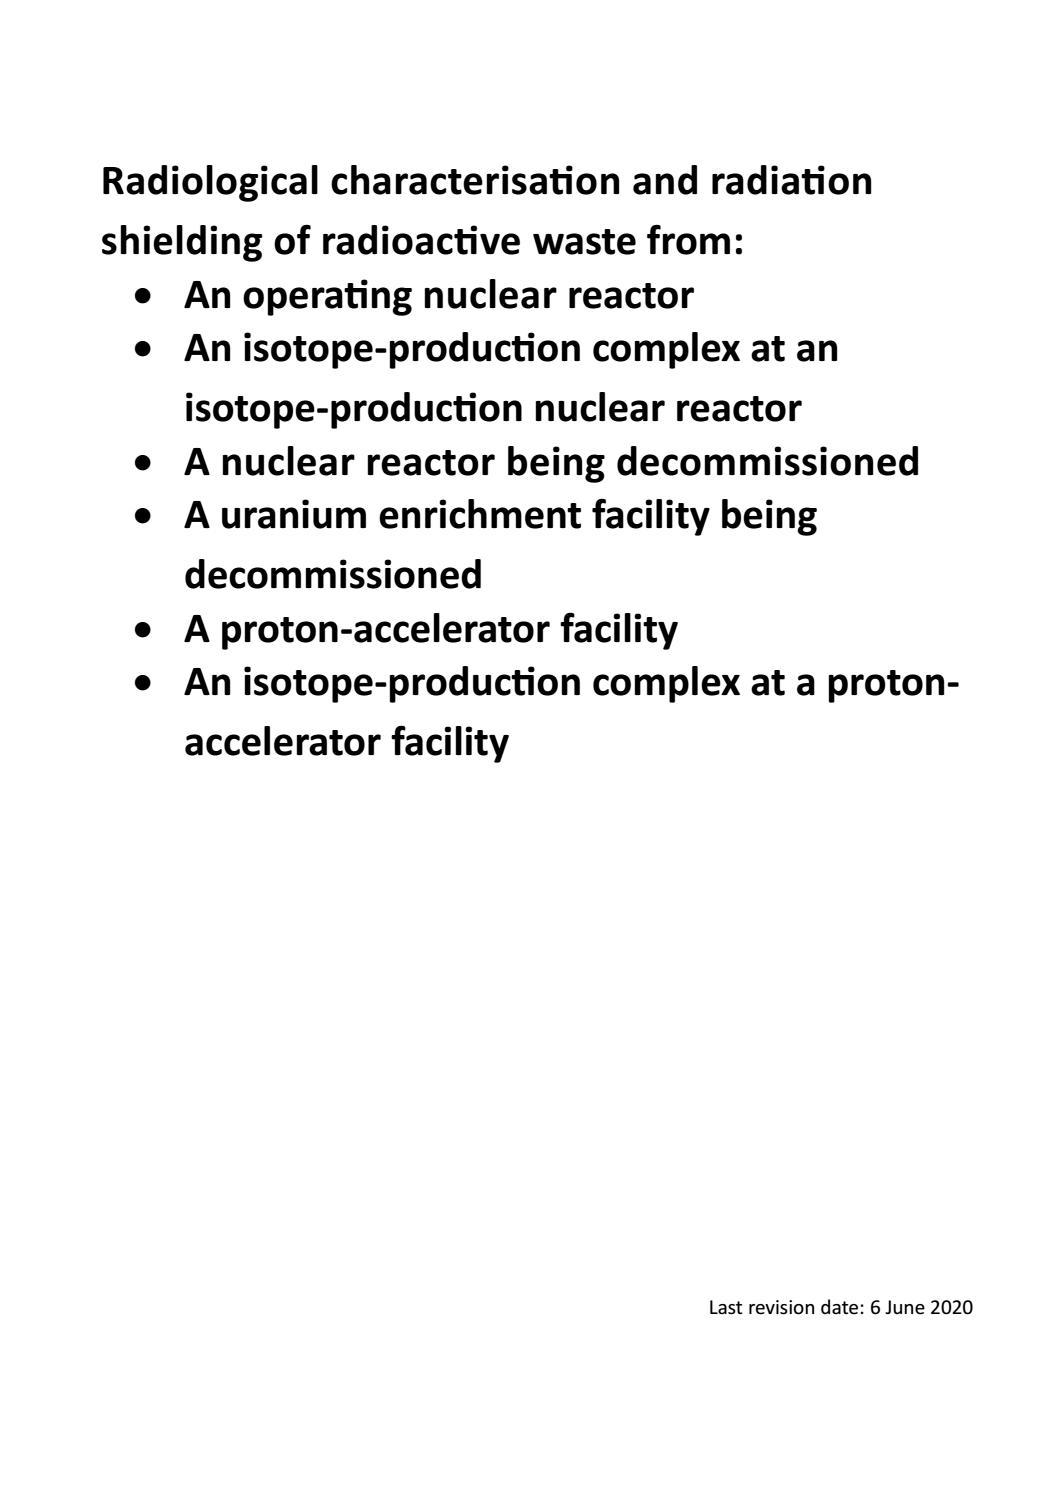 RADIOACTIVE WASTE: COMPUTATIONAL CHARACTERISATION and SHIELDING page 1